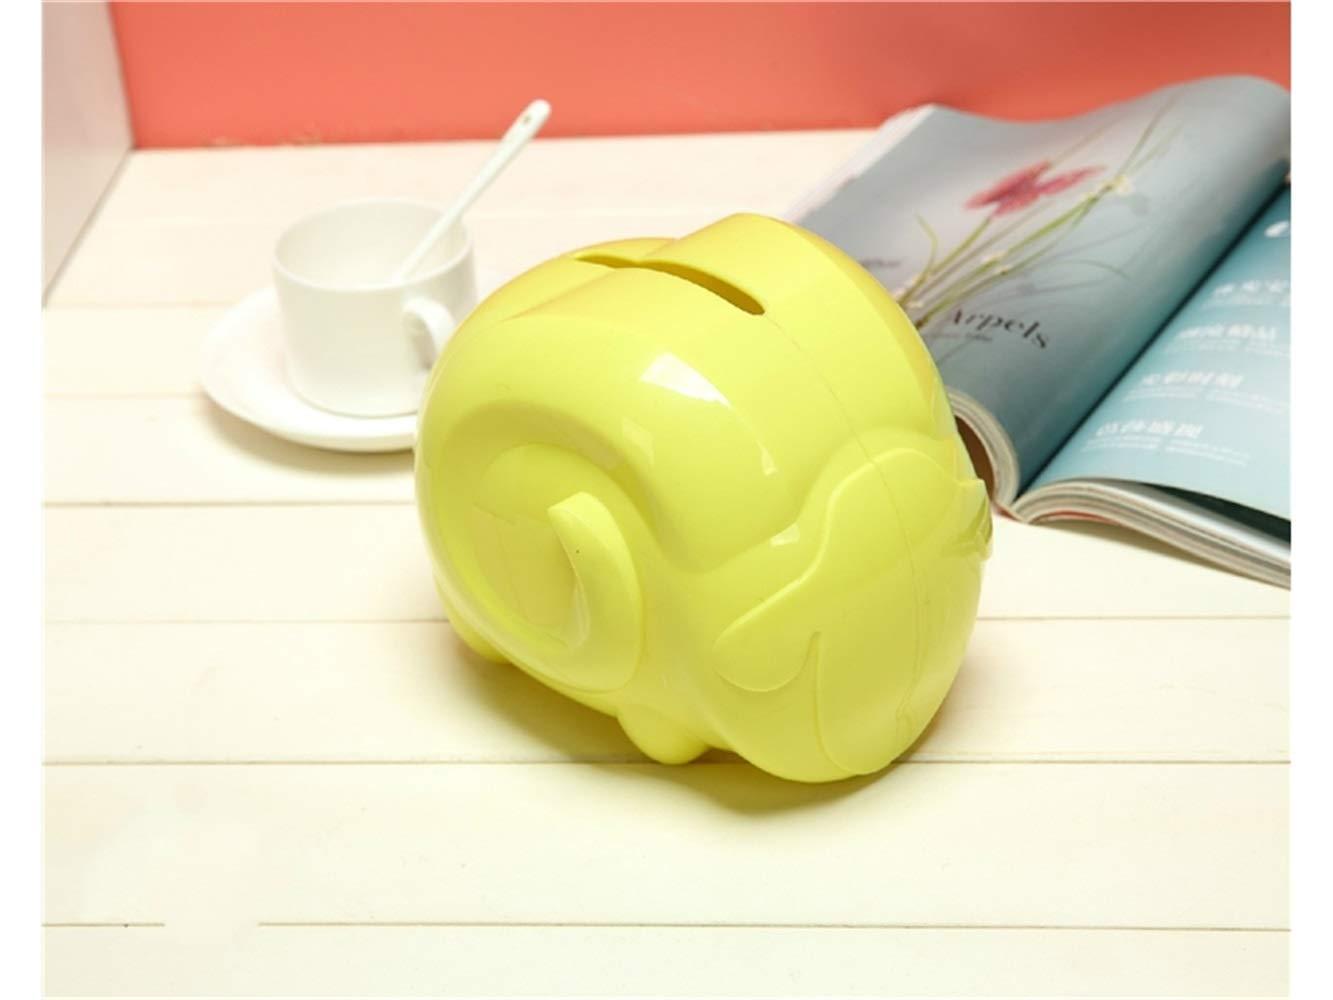 Pullic Tissue Box Portable Cartoon Sheep Shape Tissue Boxes Tissue Napkin Case for Room and Toilet(Yellow)